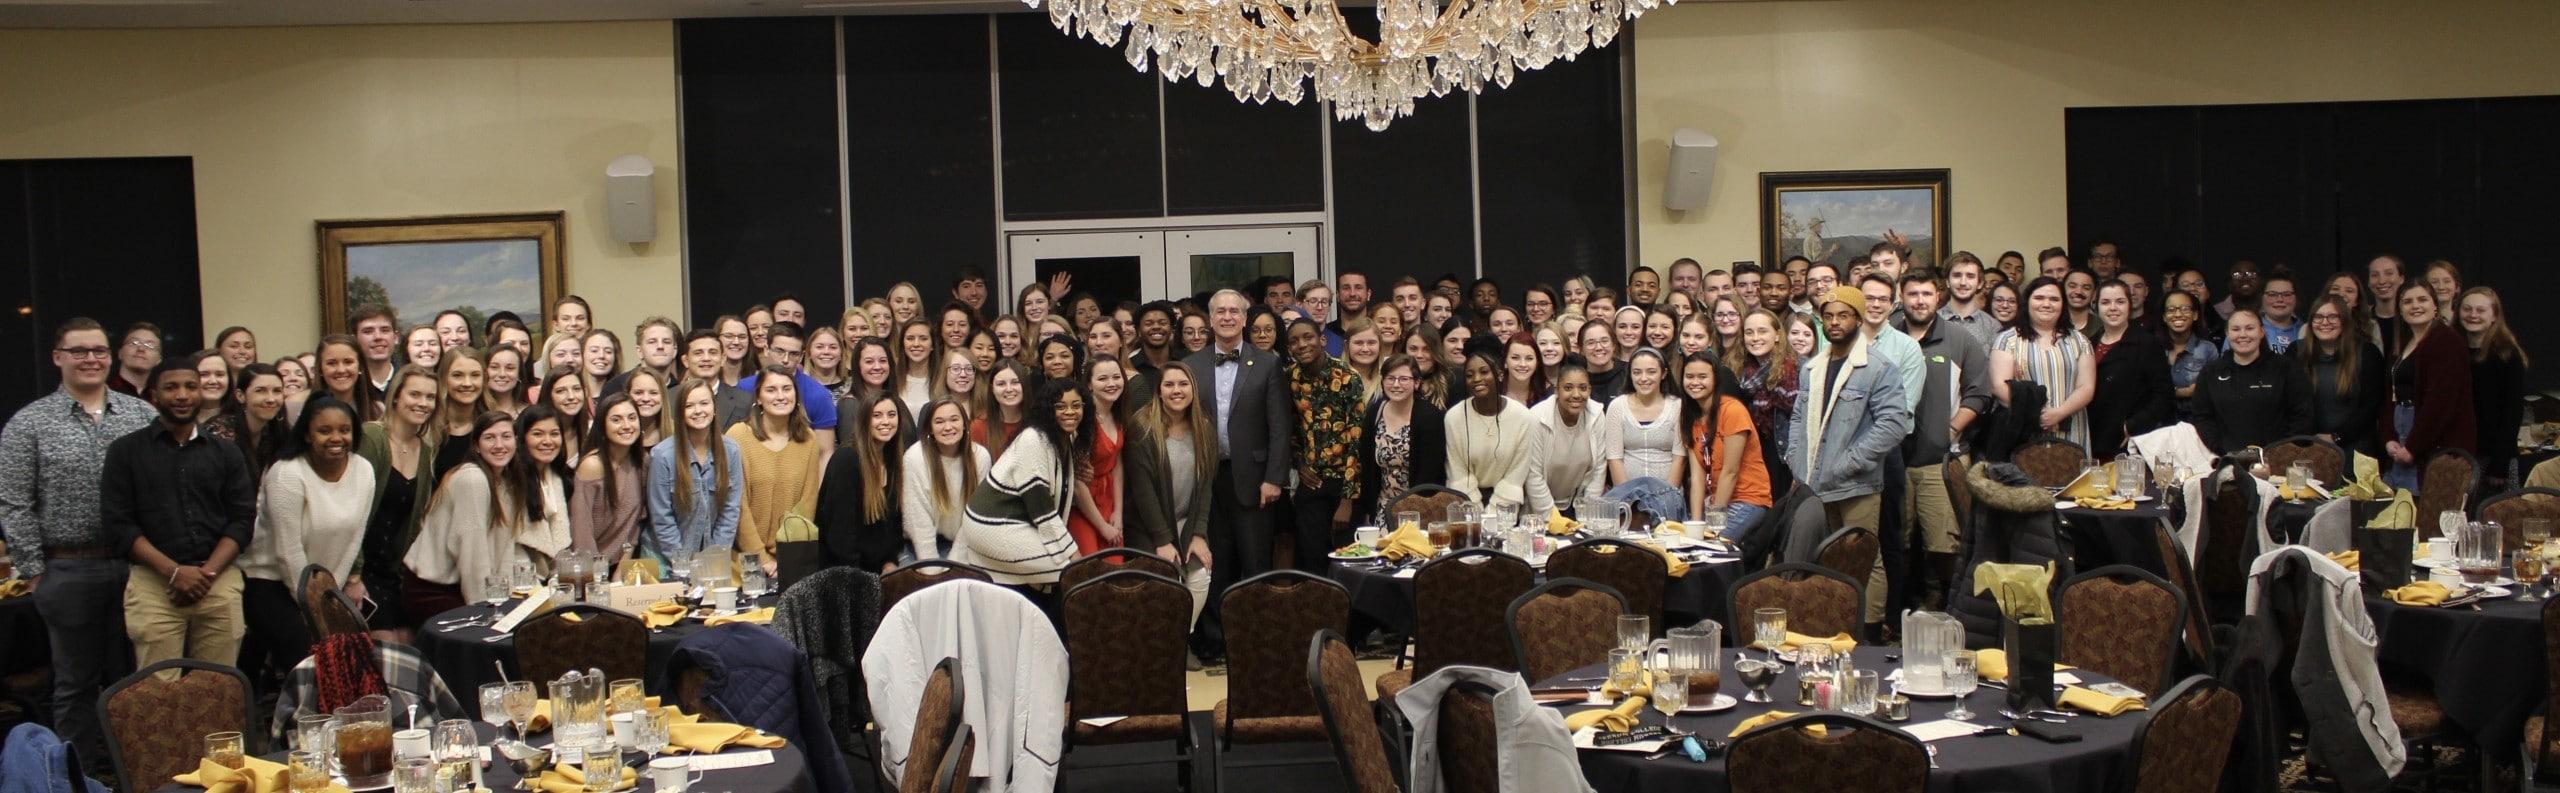 Ferrum College President's & Dean's List, Spring & Fall 2019